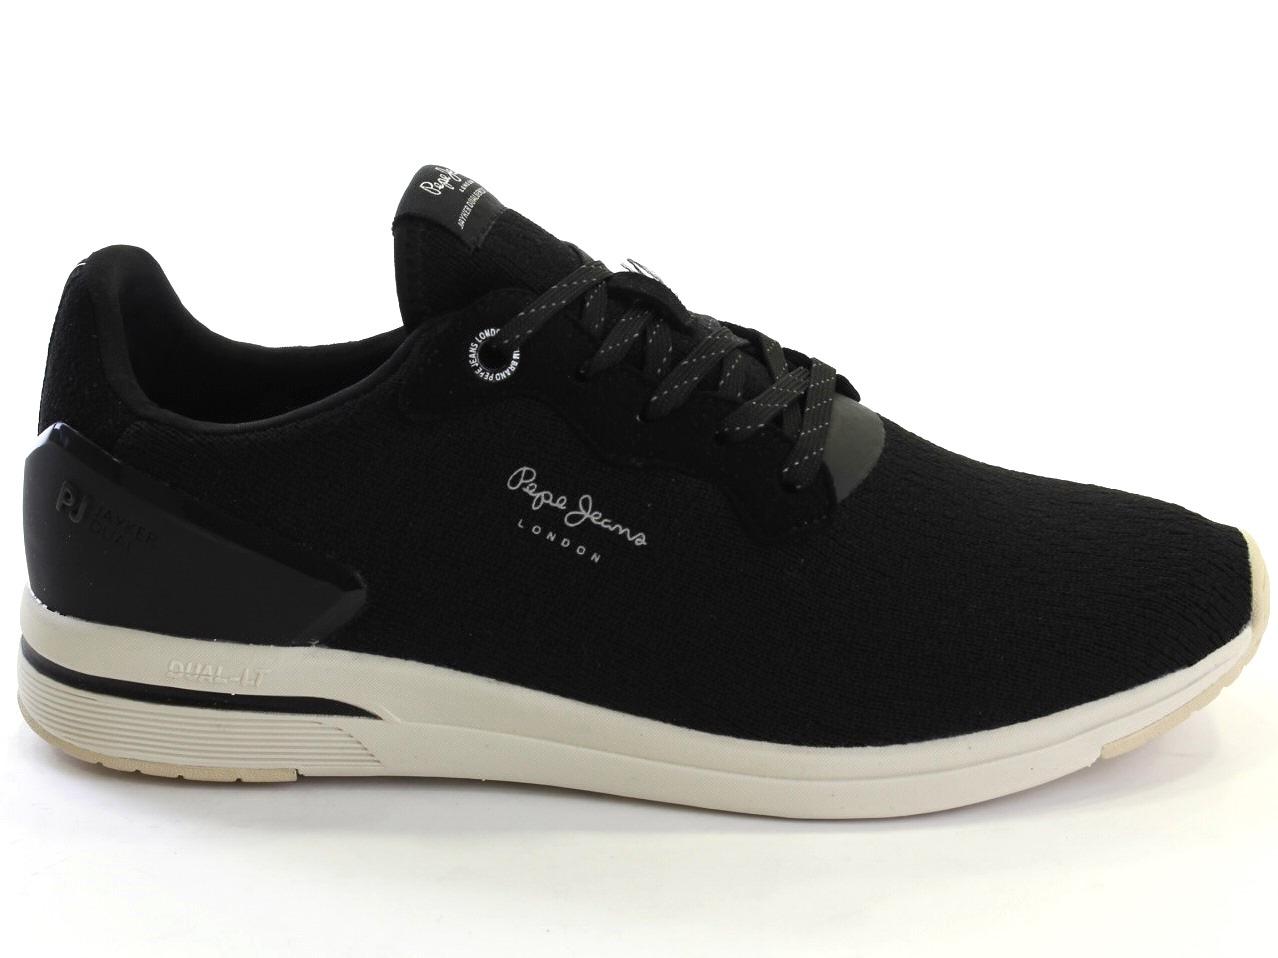 Sneakers, Espadrilles Pepe Jeans - 608 PMS30518